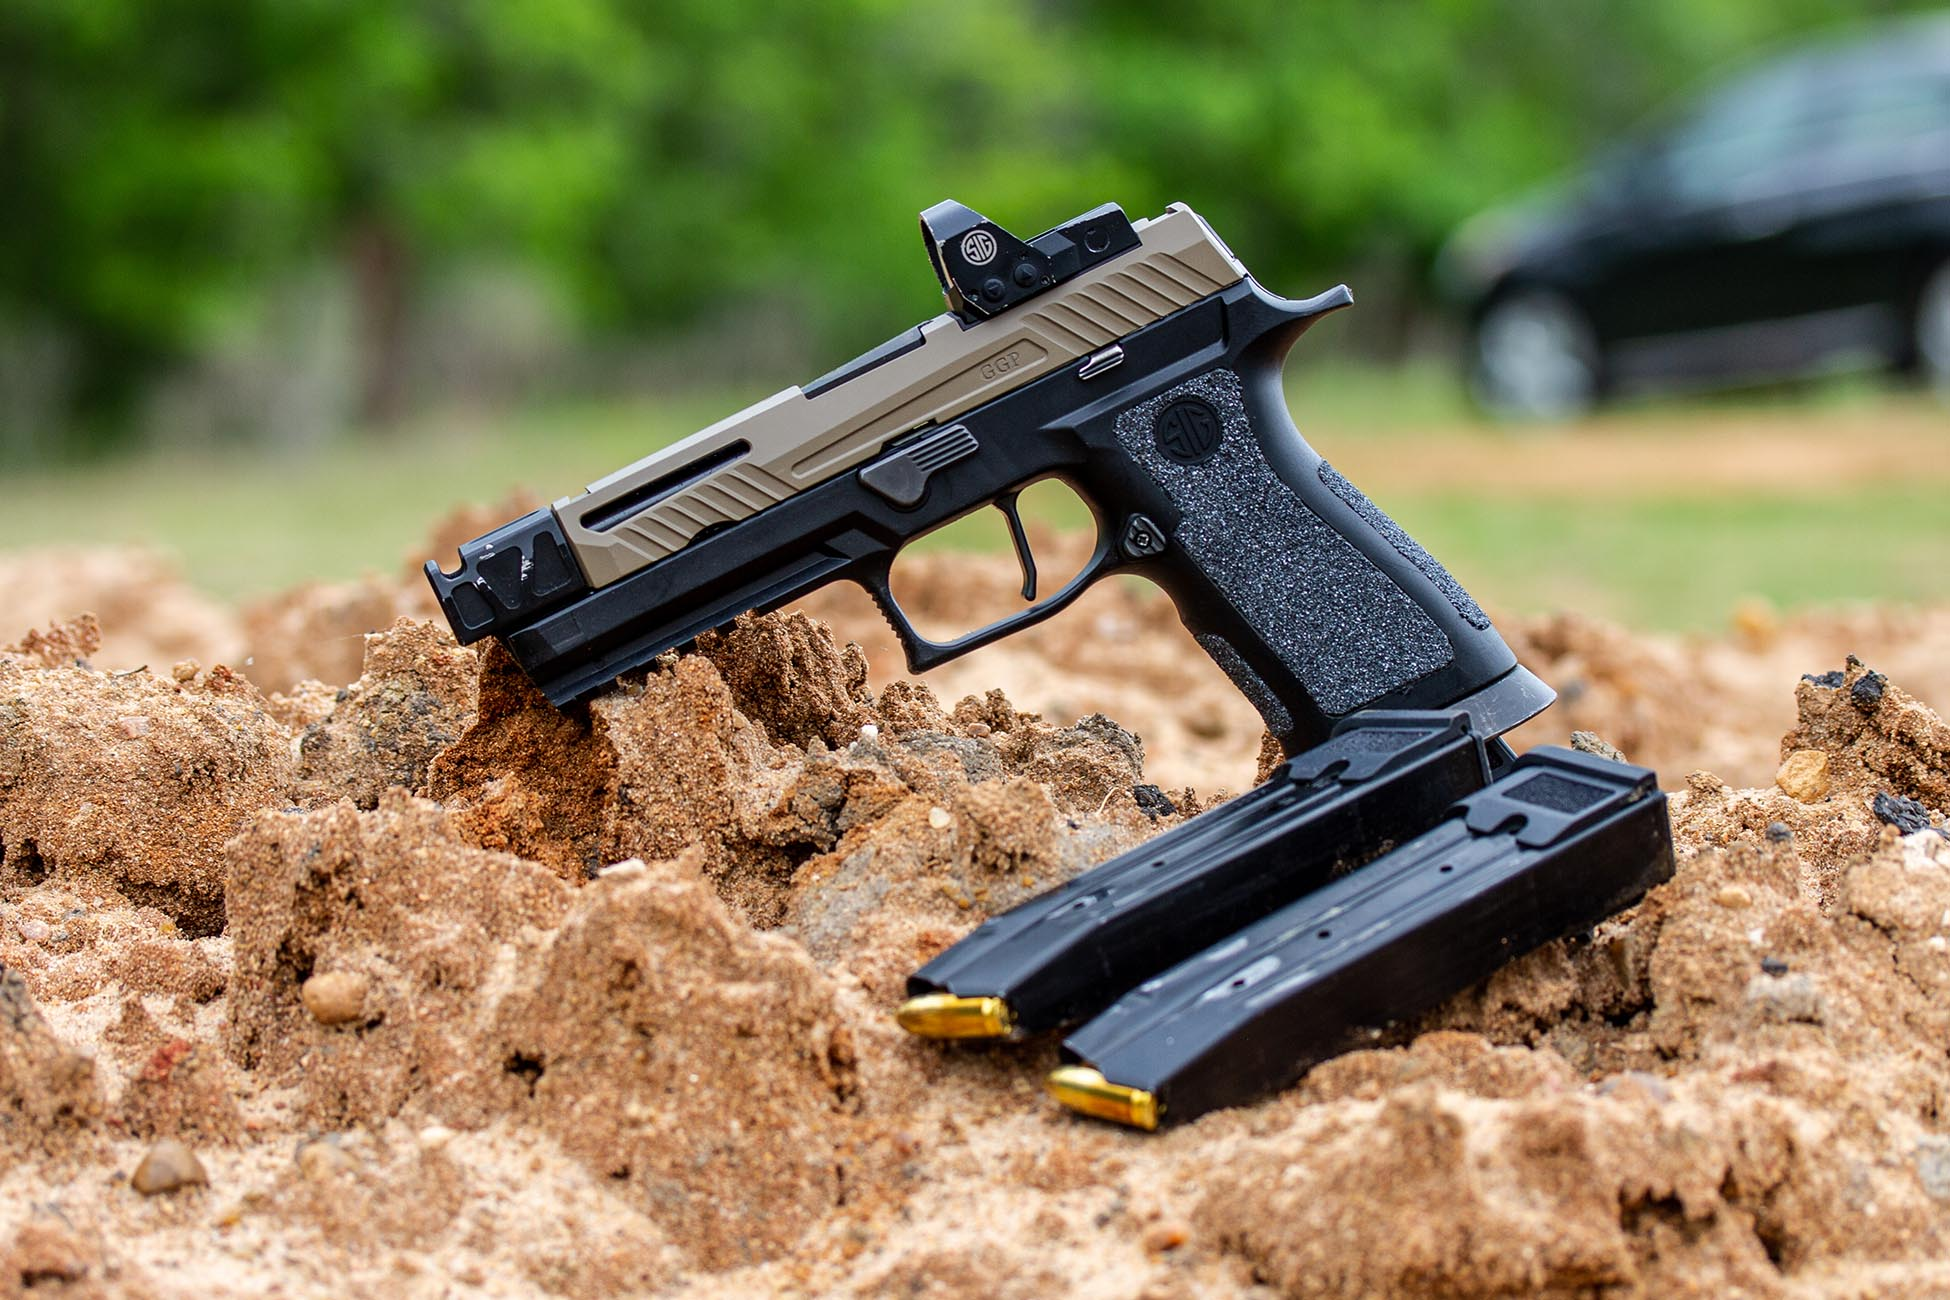 SIG P320 Pistol with 9mm Full Metal Jacket target ammunition